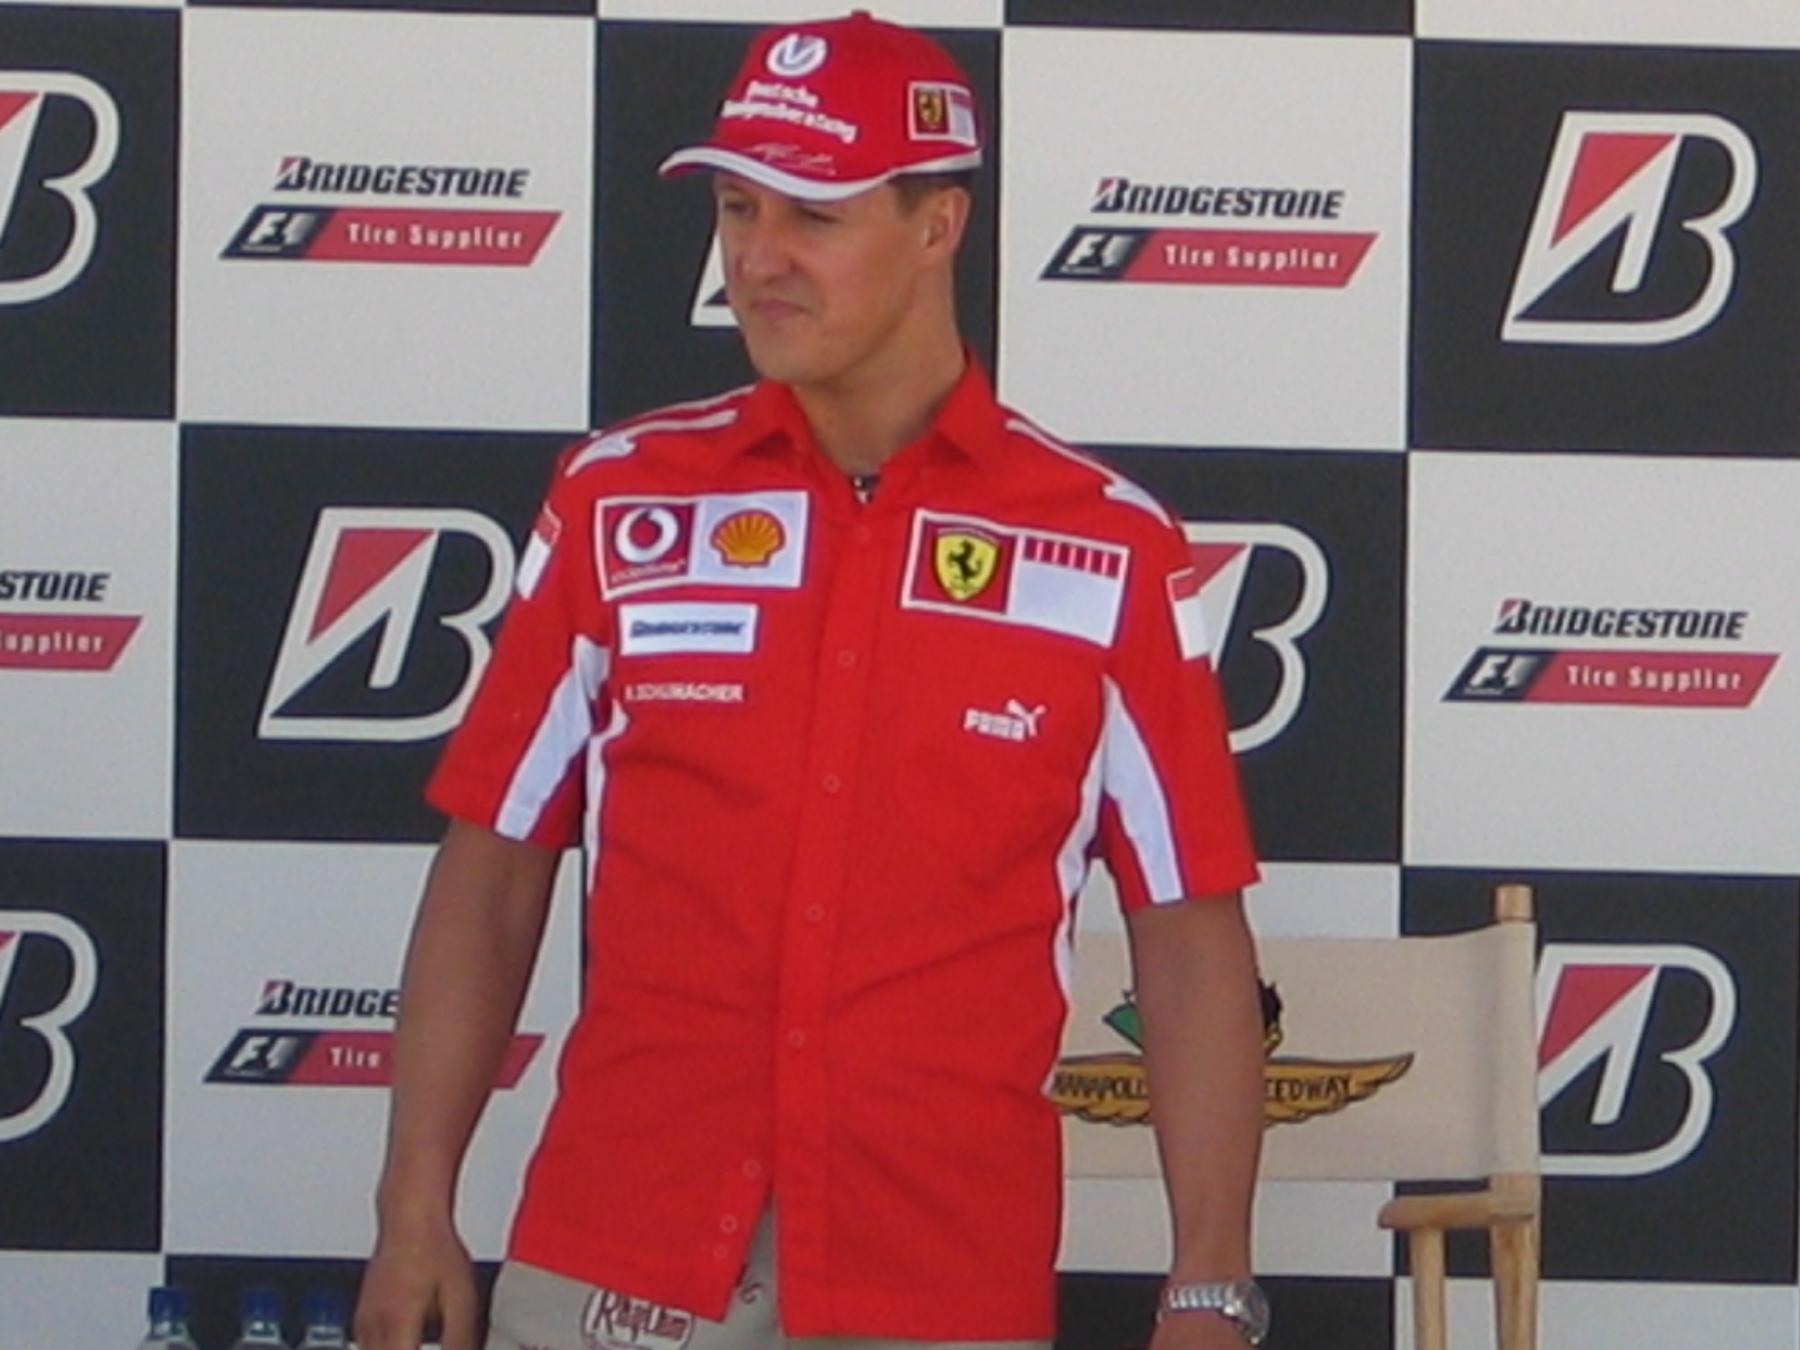 Michael Schumacher-I'm the man